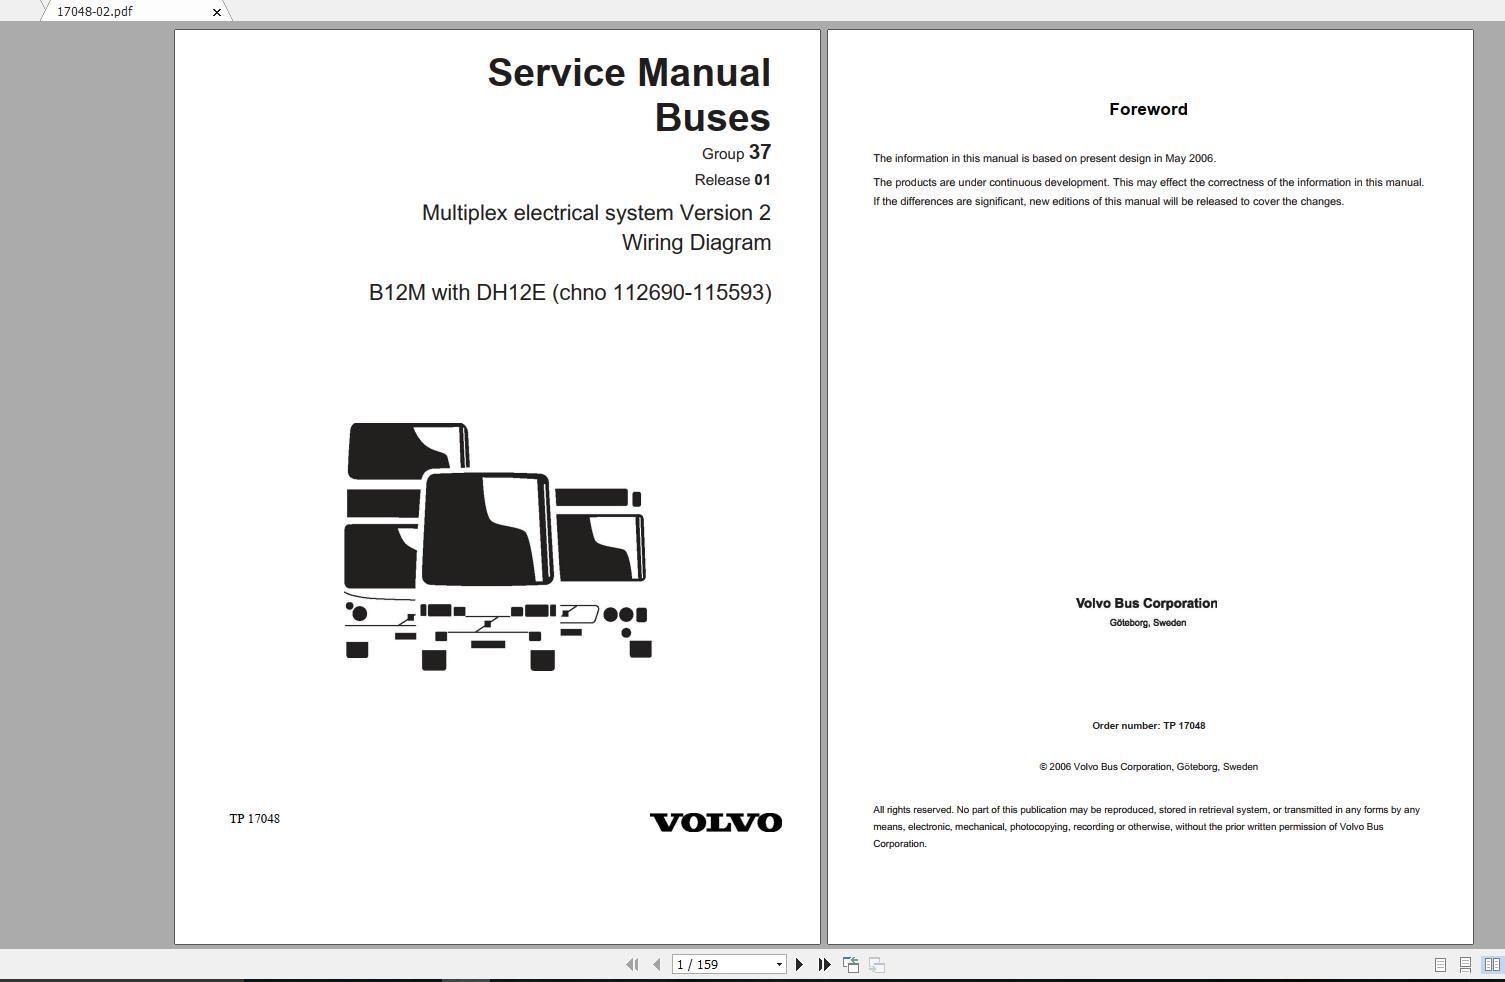 volvo b12m trucks service manual buses & wiring diagrams - auto repair  software-auto epc software-auto repair manual-workshop manual-service  manual-workshop manual  auto repair software-auto epc software-auto repair manual